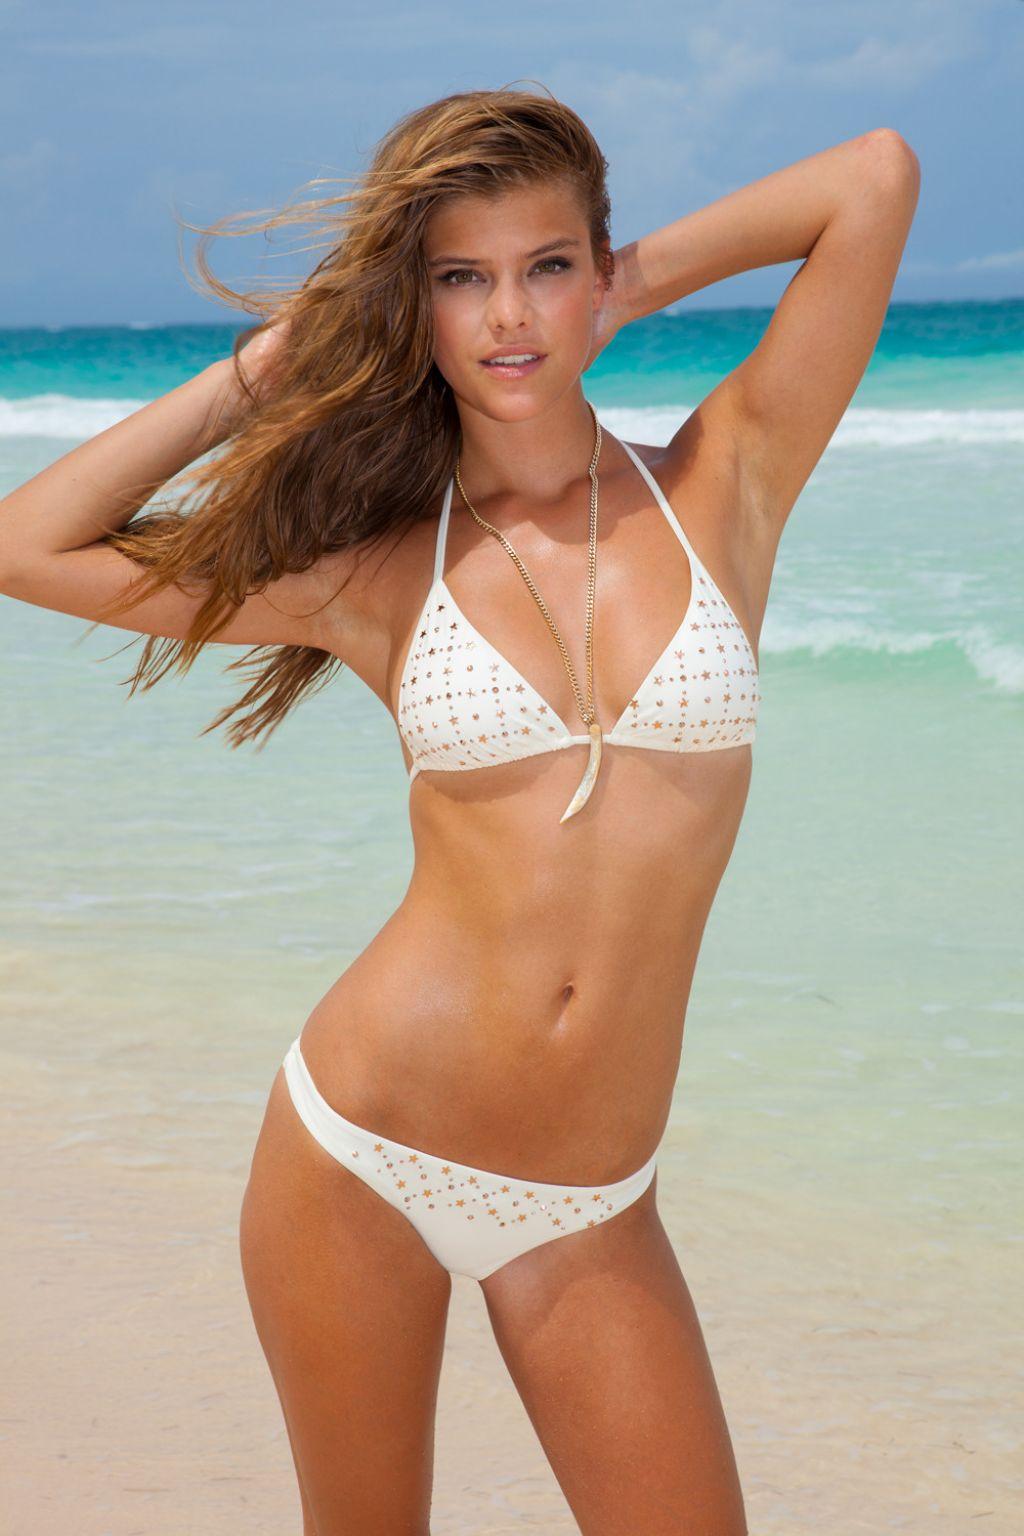 Bikini high quality